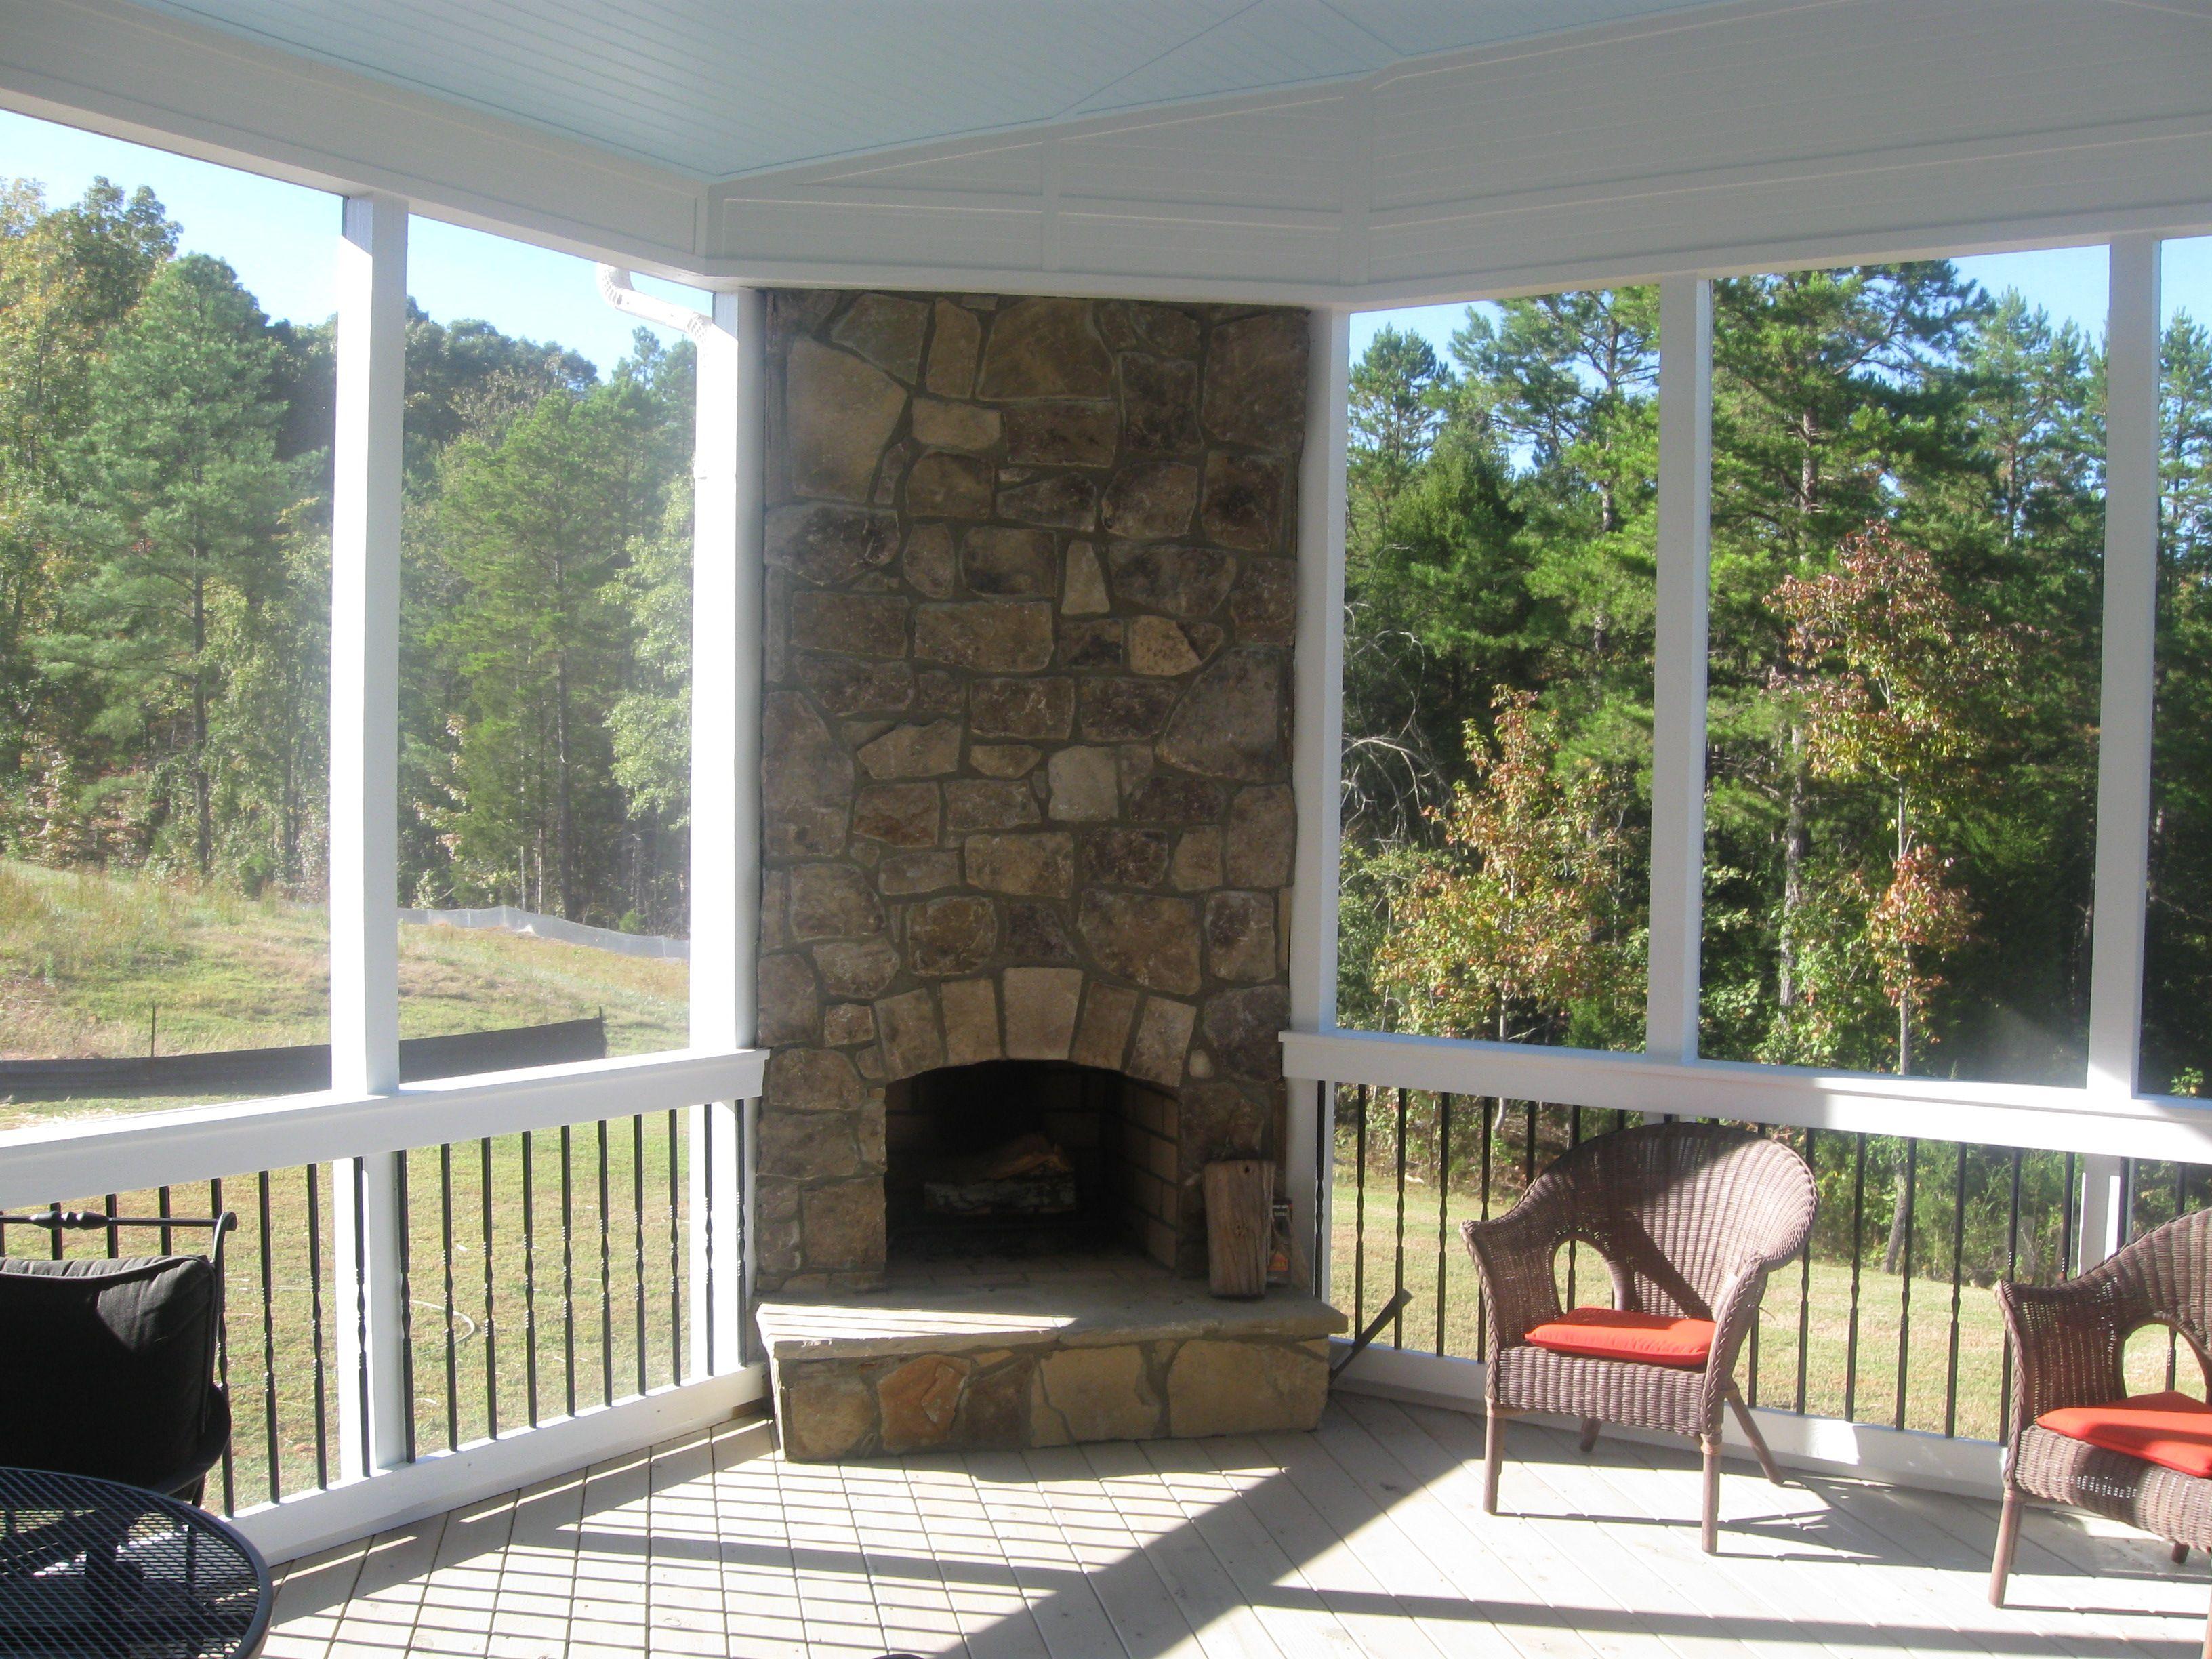 Sun Porch Design Ideas Outdoor Fireplace Integrated